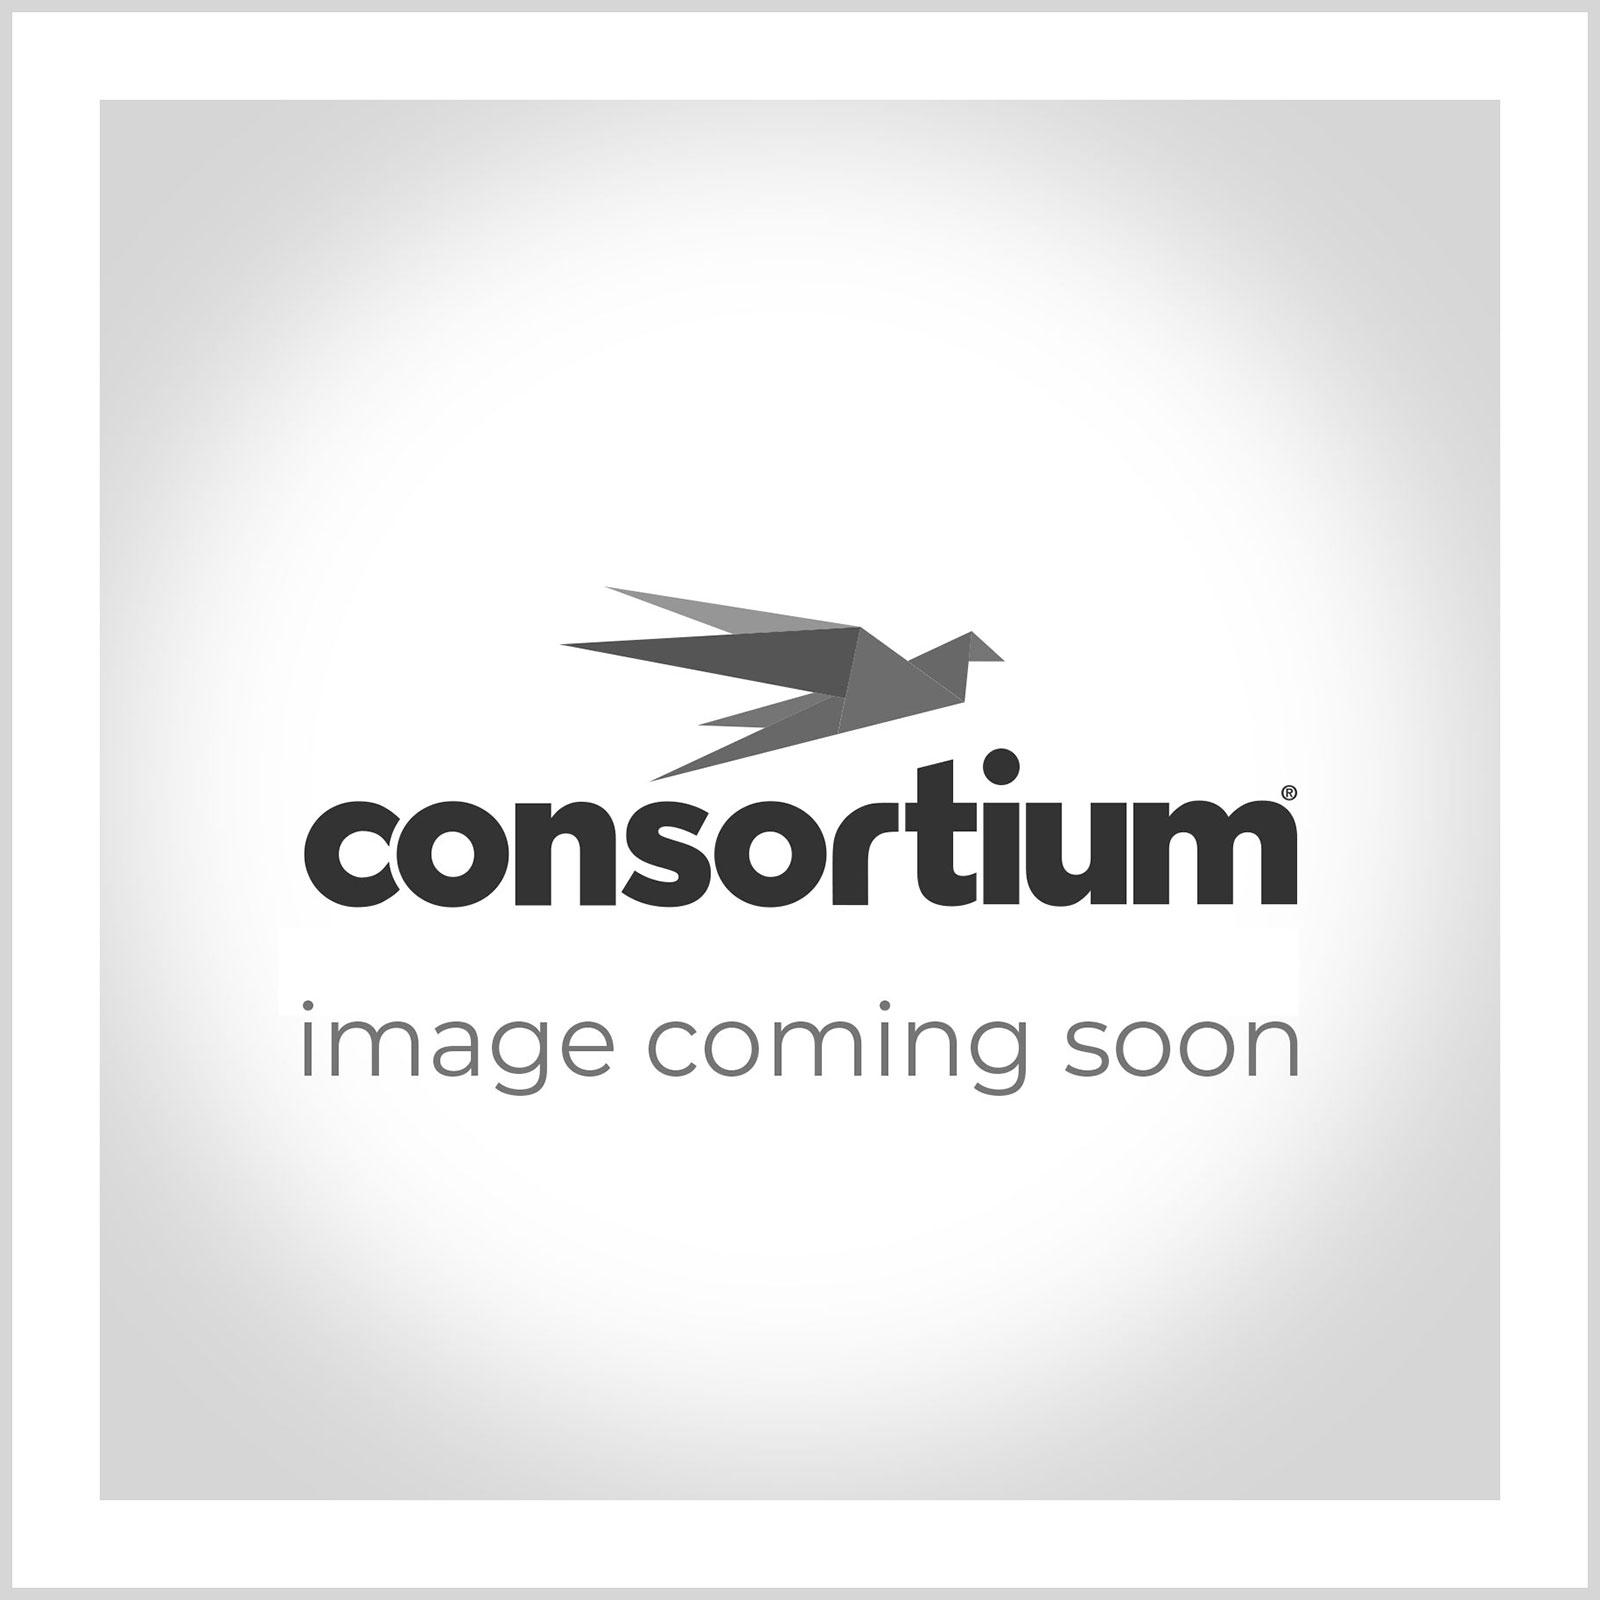 Consortium Robust Headphones